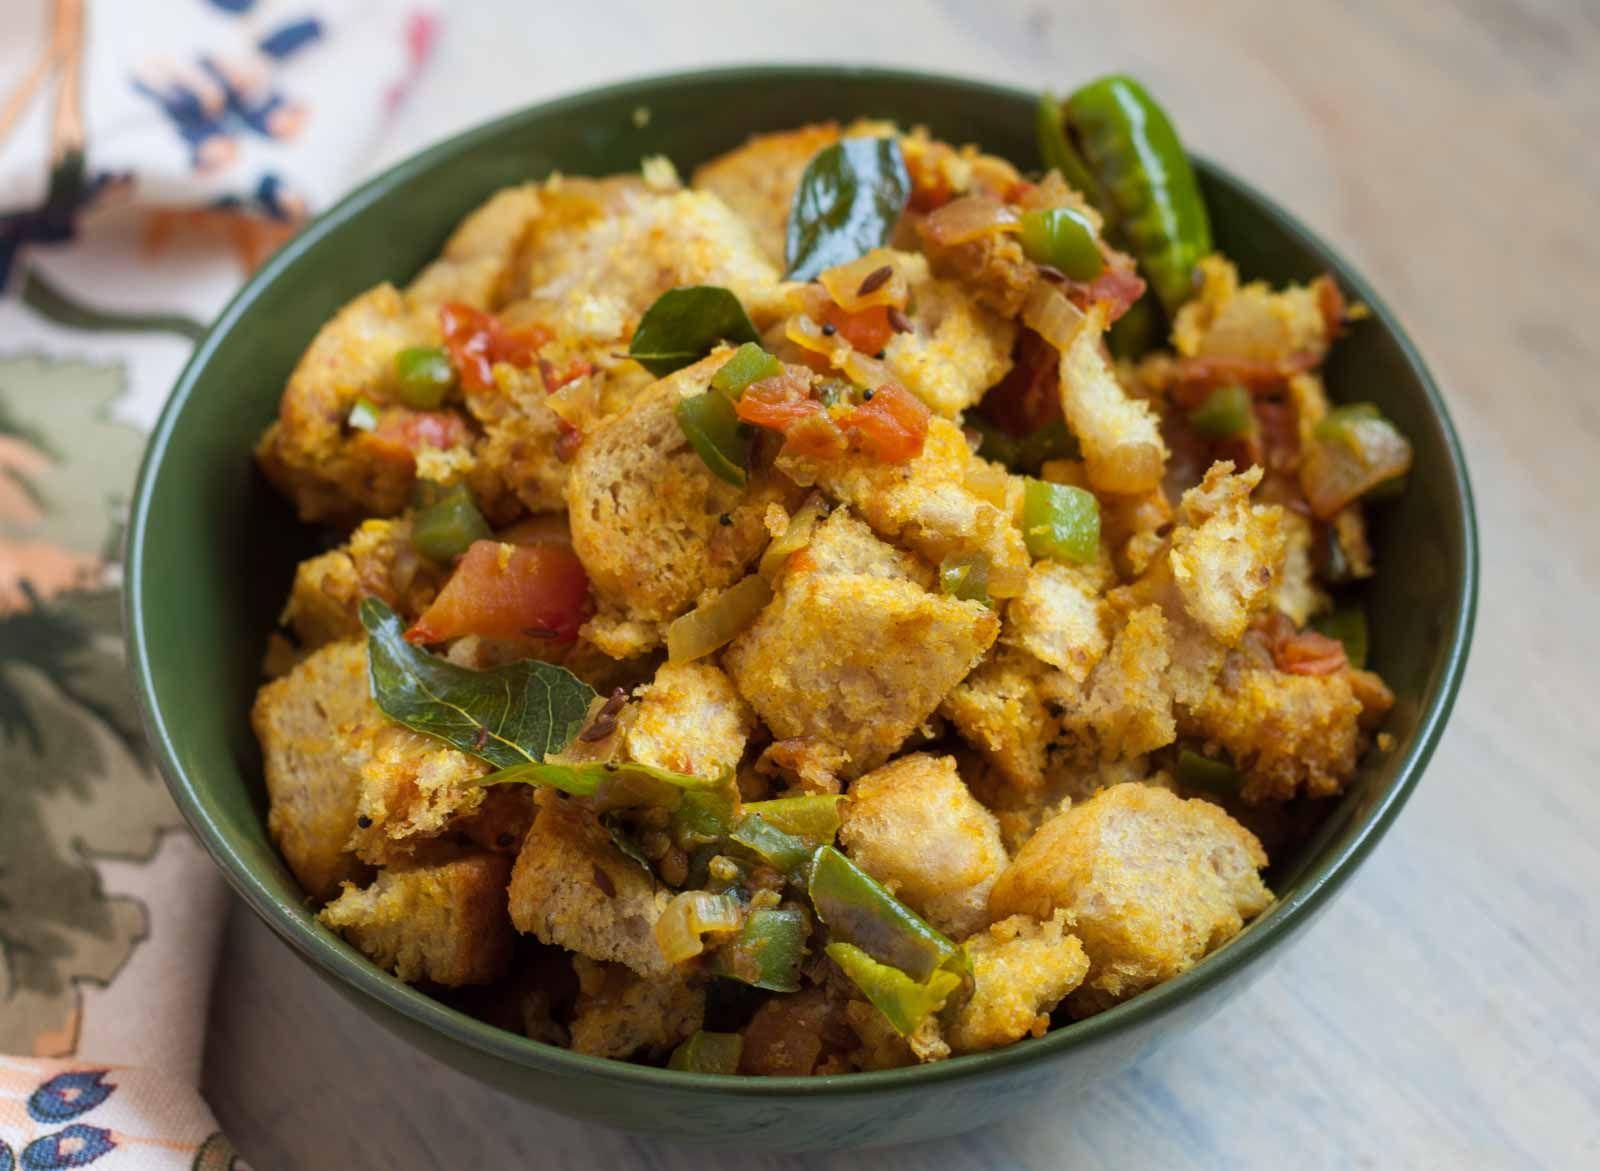 Spicy And Tangy Bread Upma Recipe | Recipe | Upma recipe ...